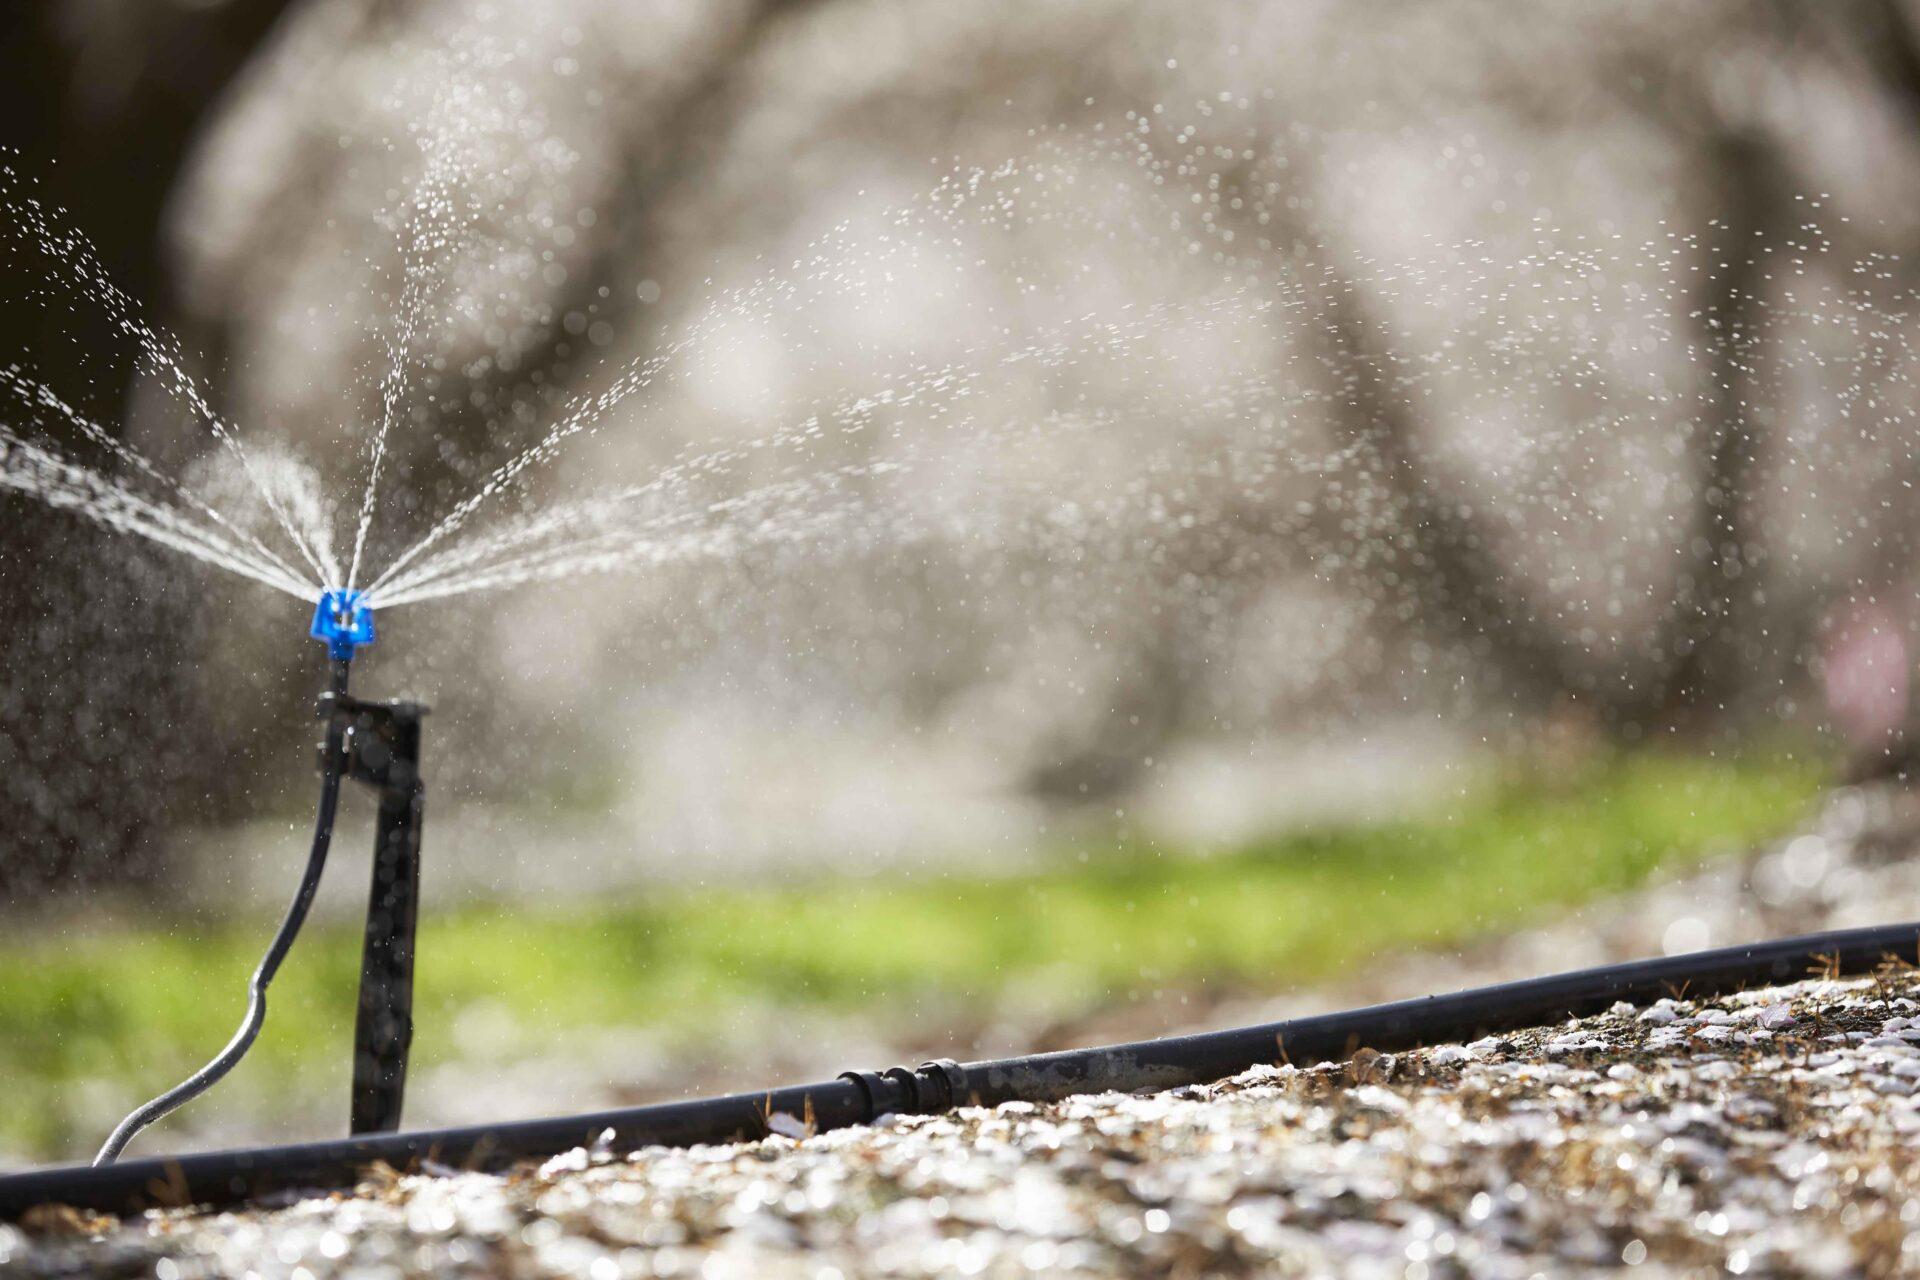 Water Use Calculator Worksheet